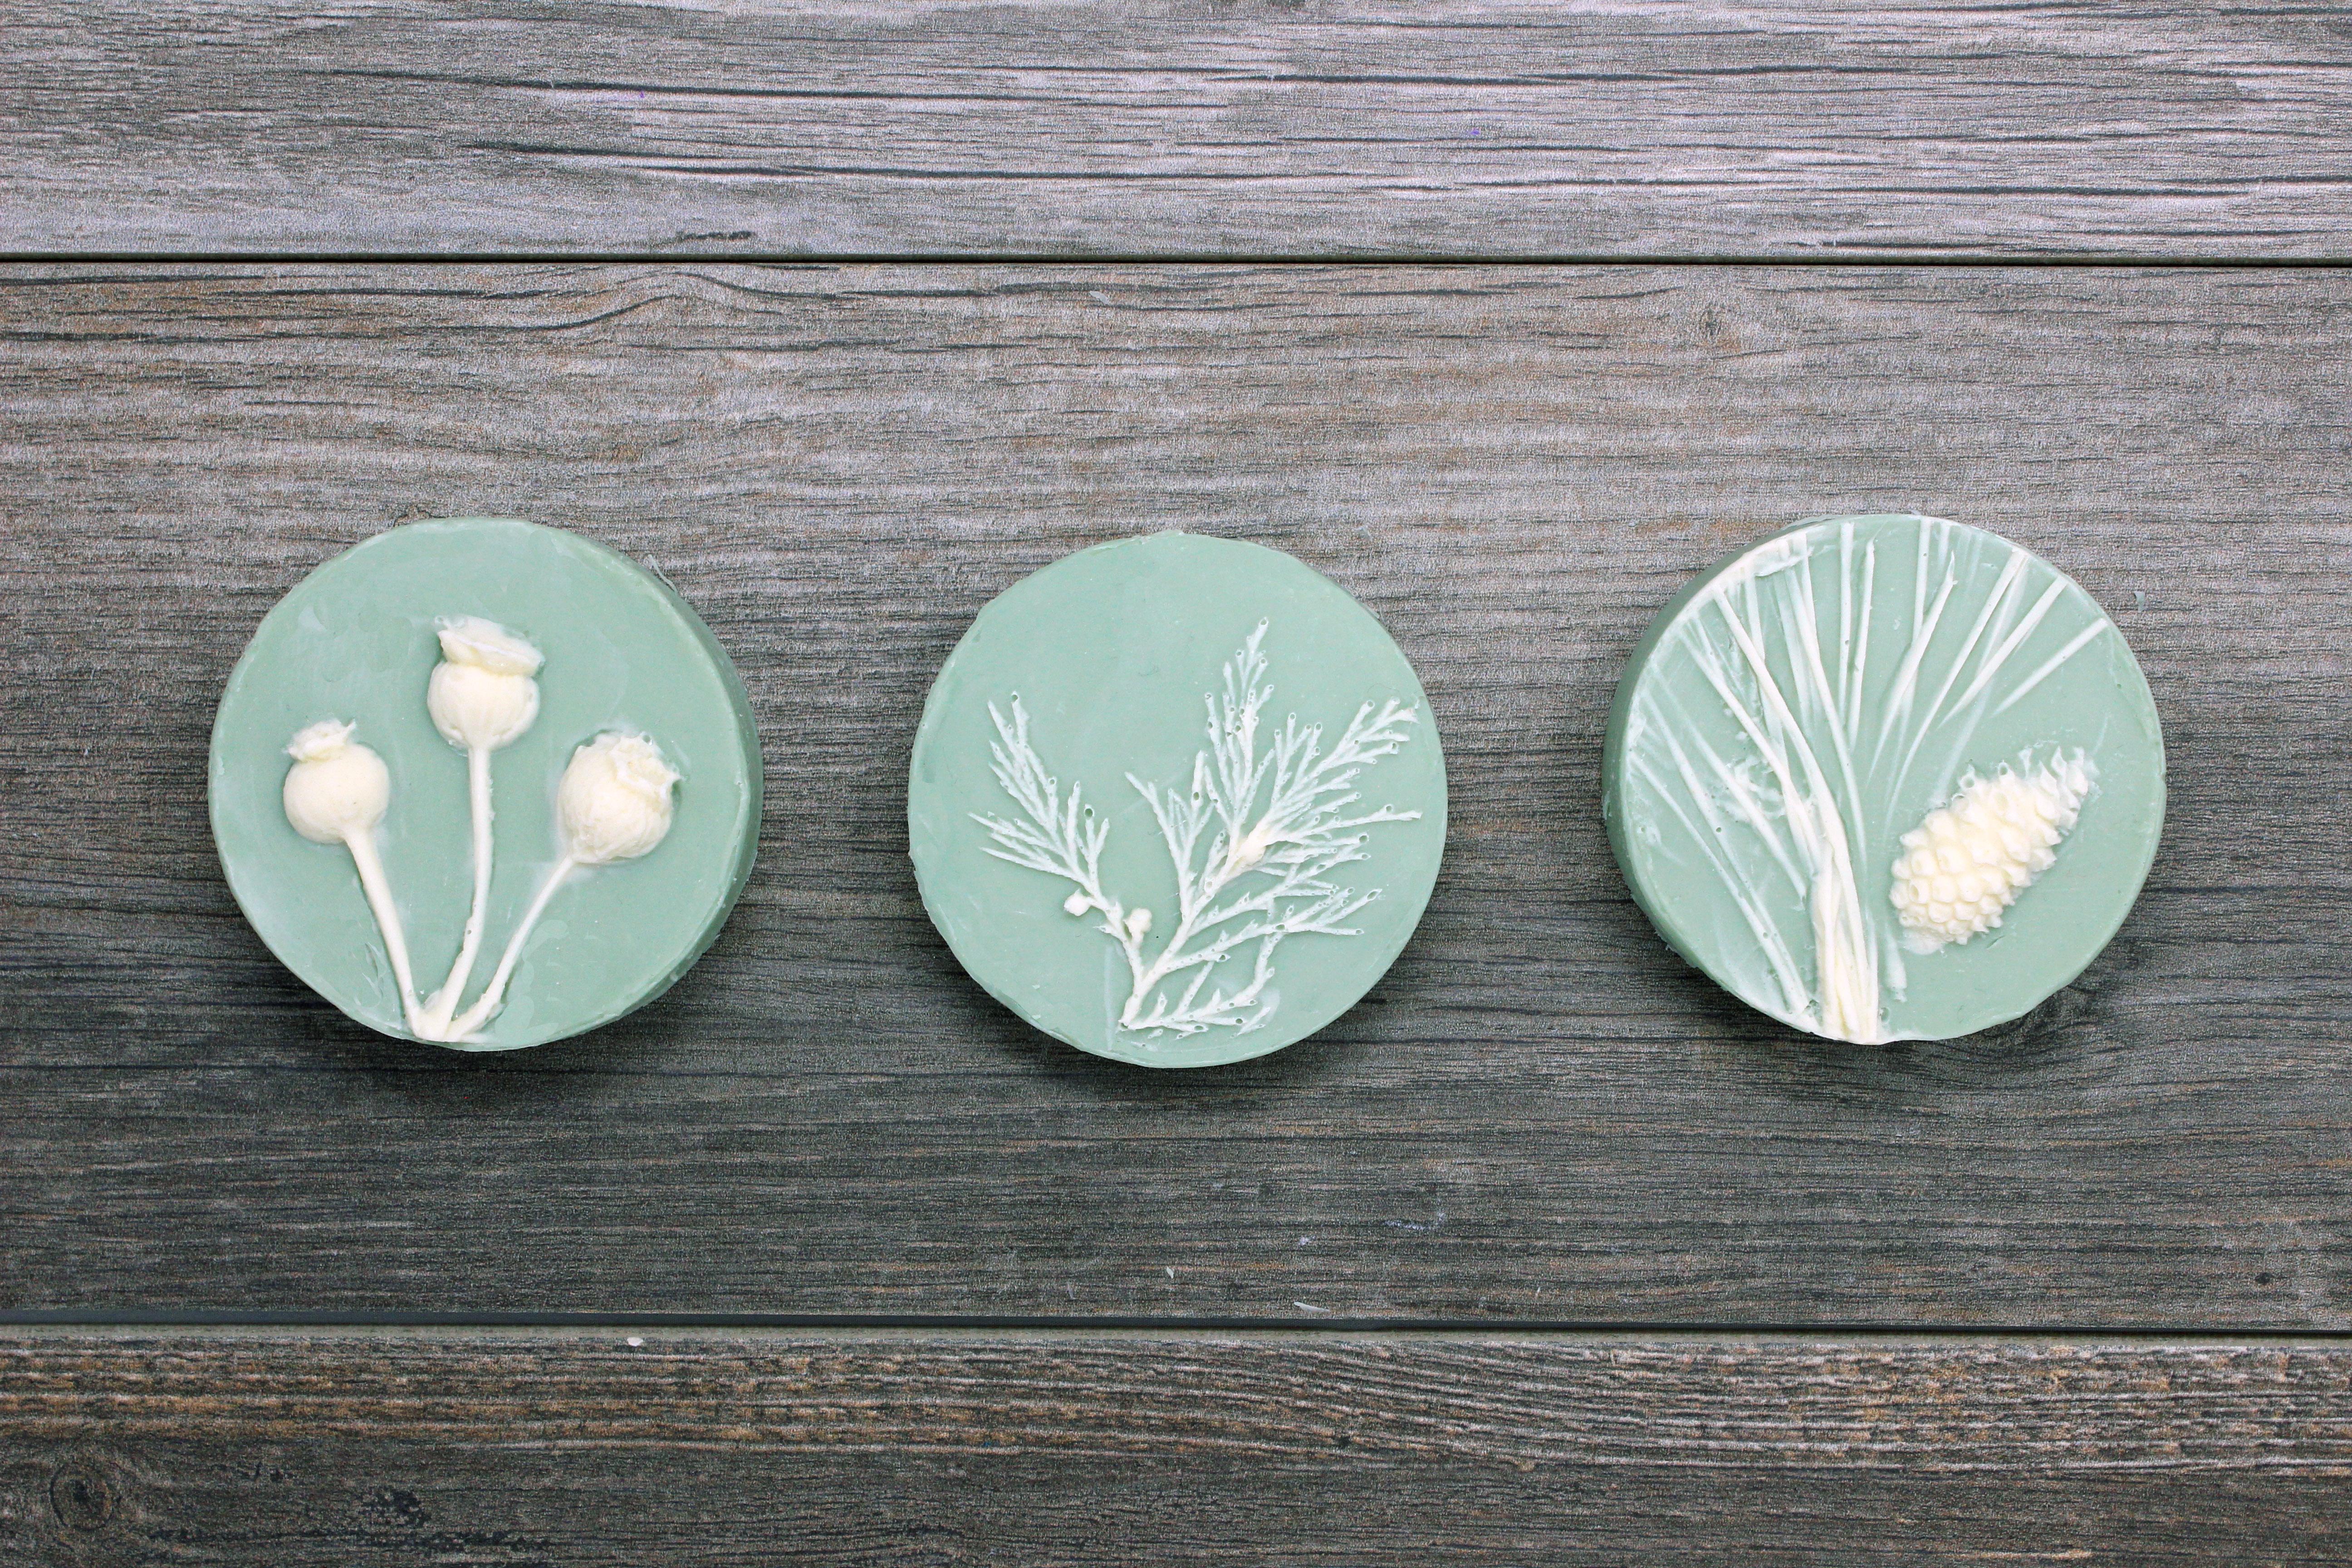 floral cameos